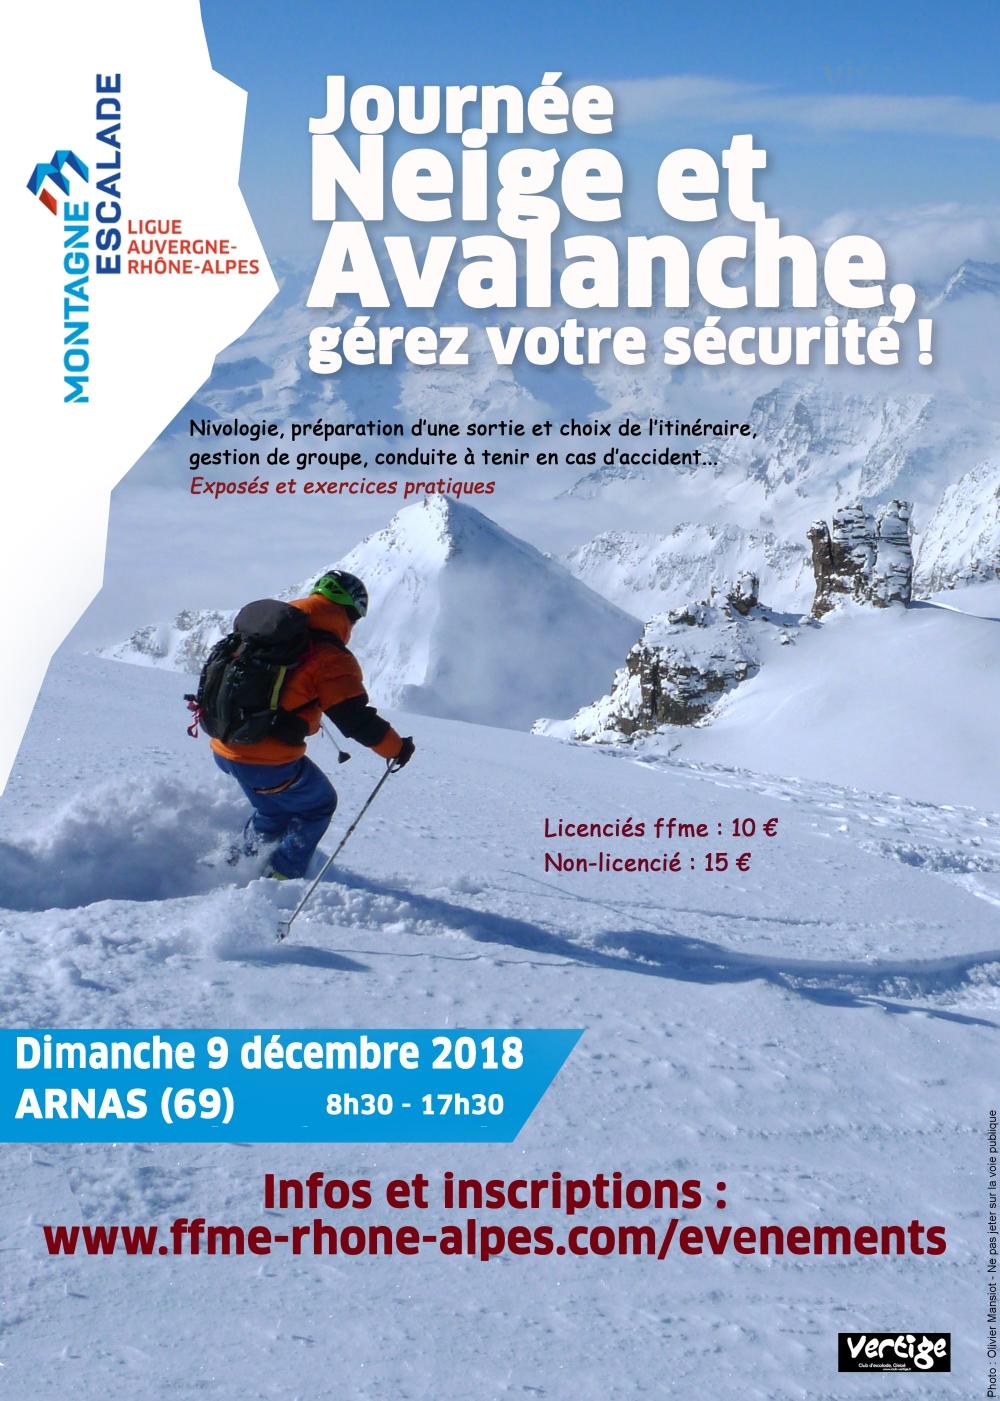 2018 neige avalanche ARNAS